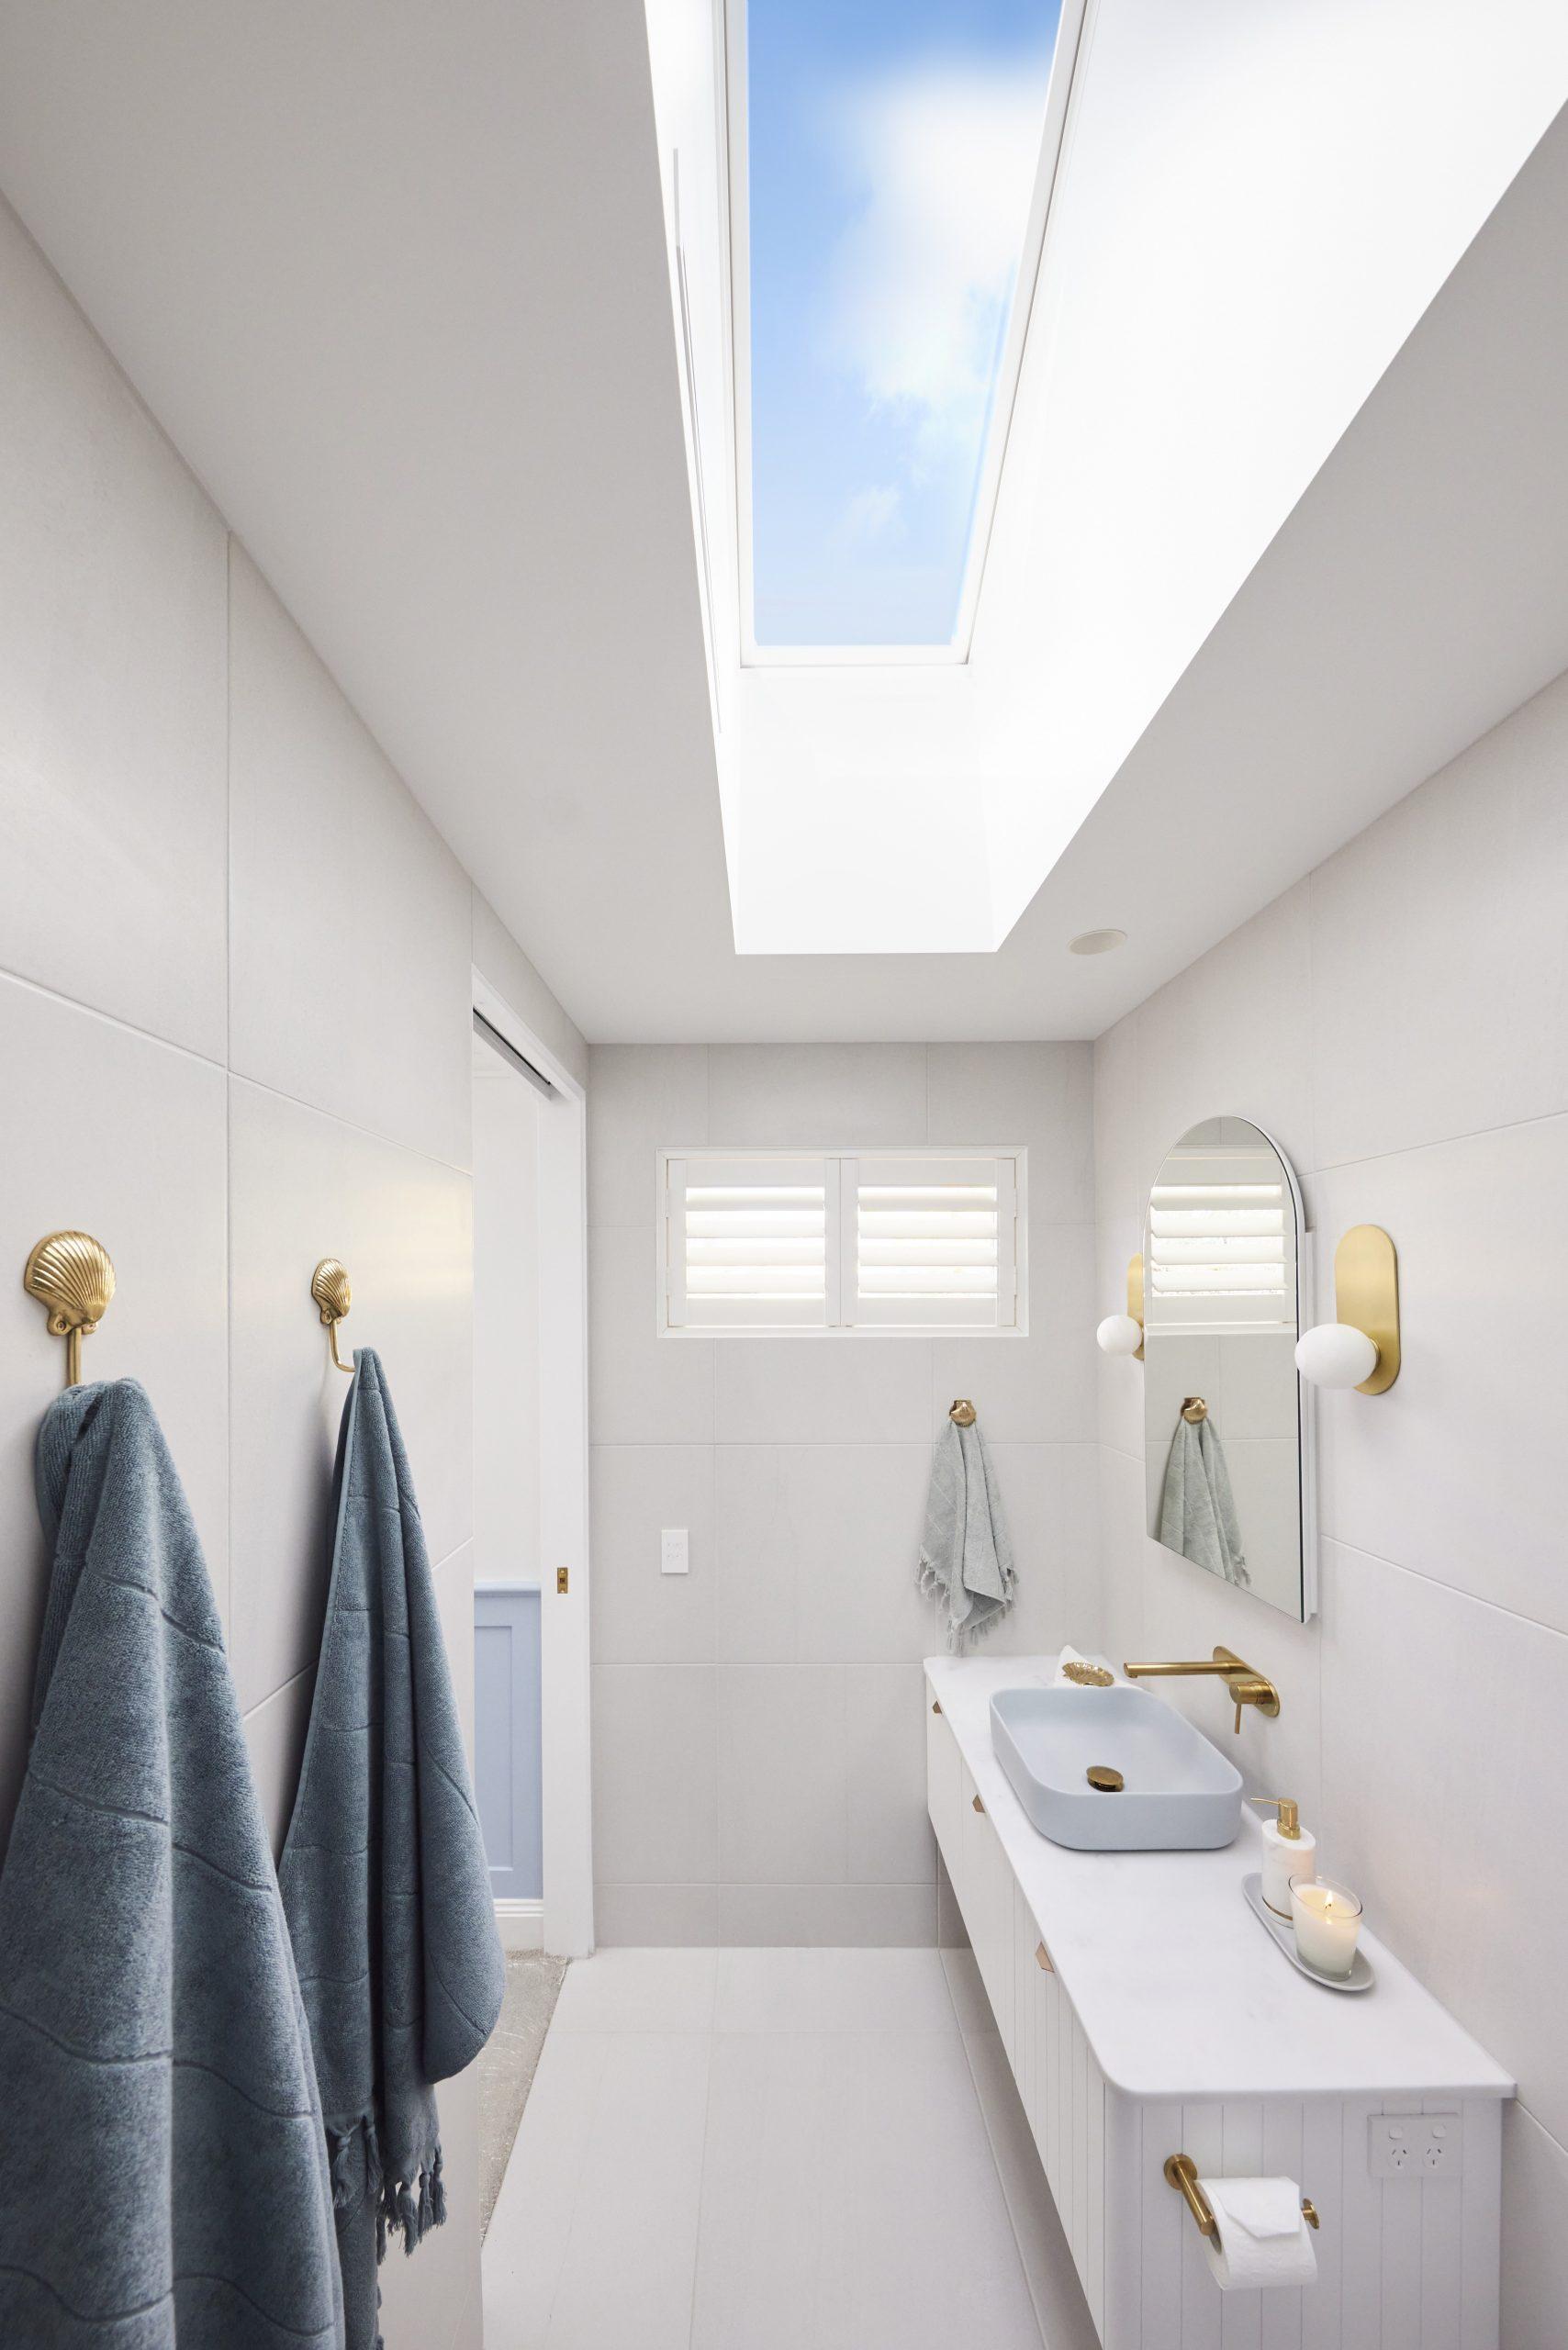 Perth skylights